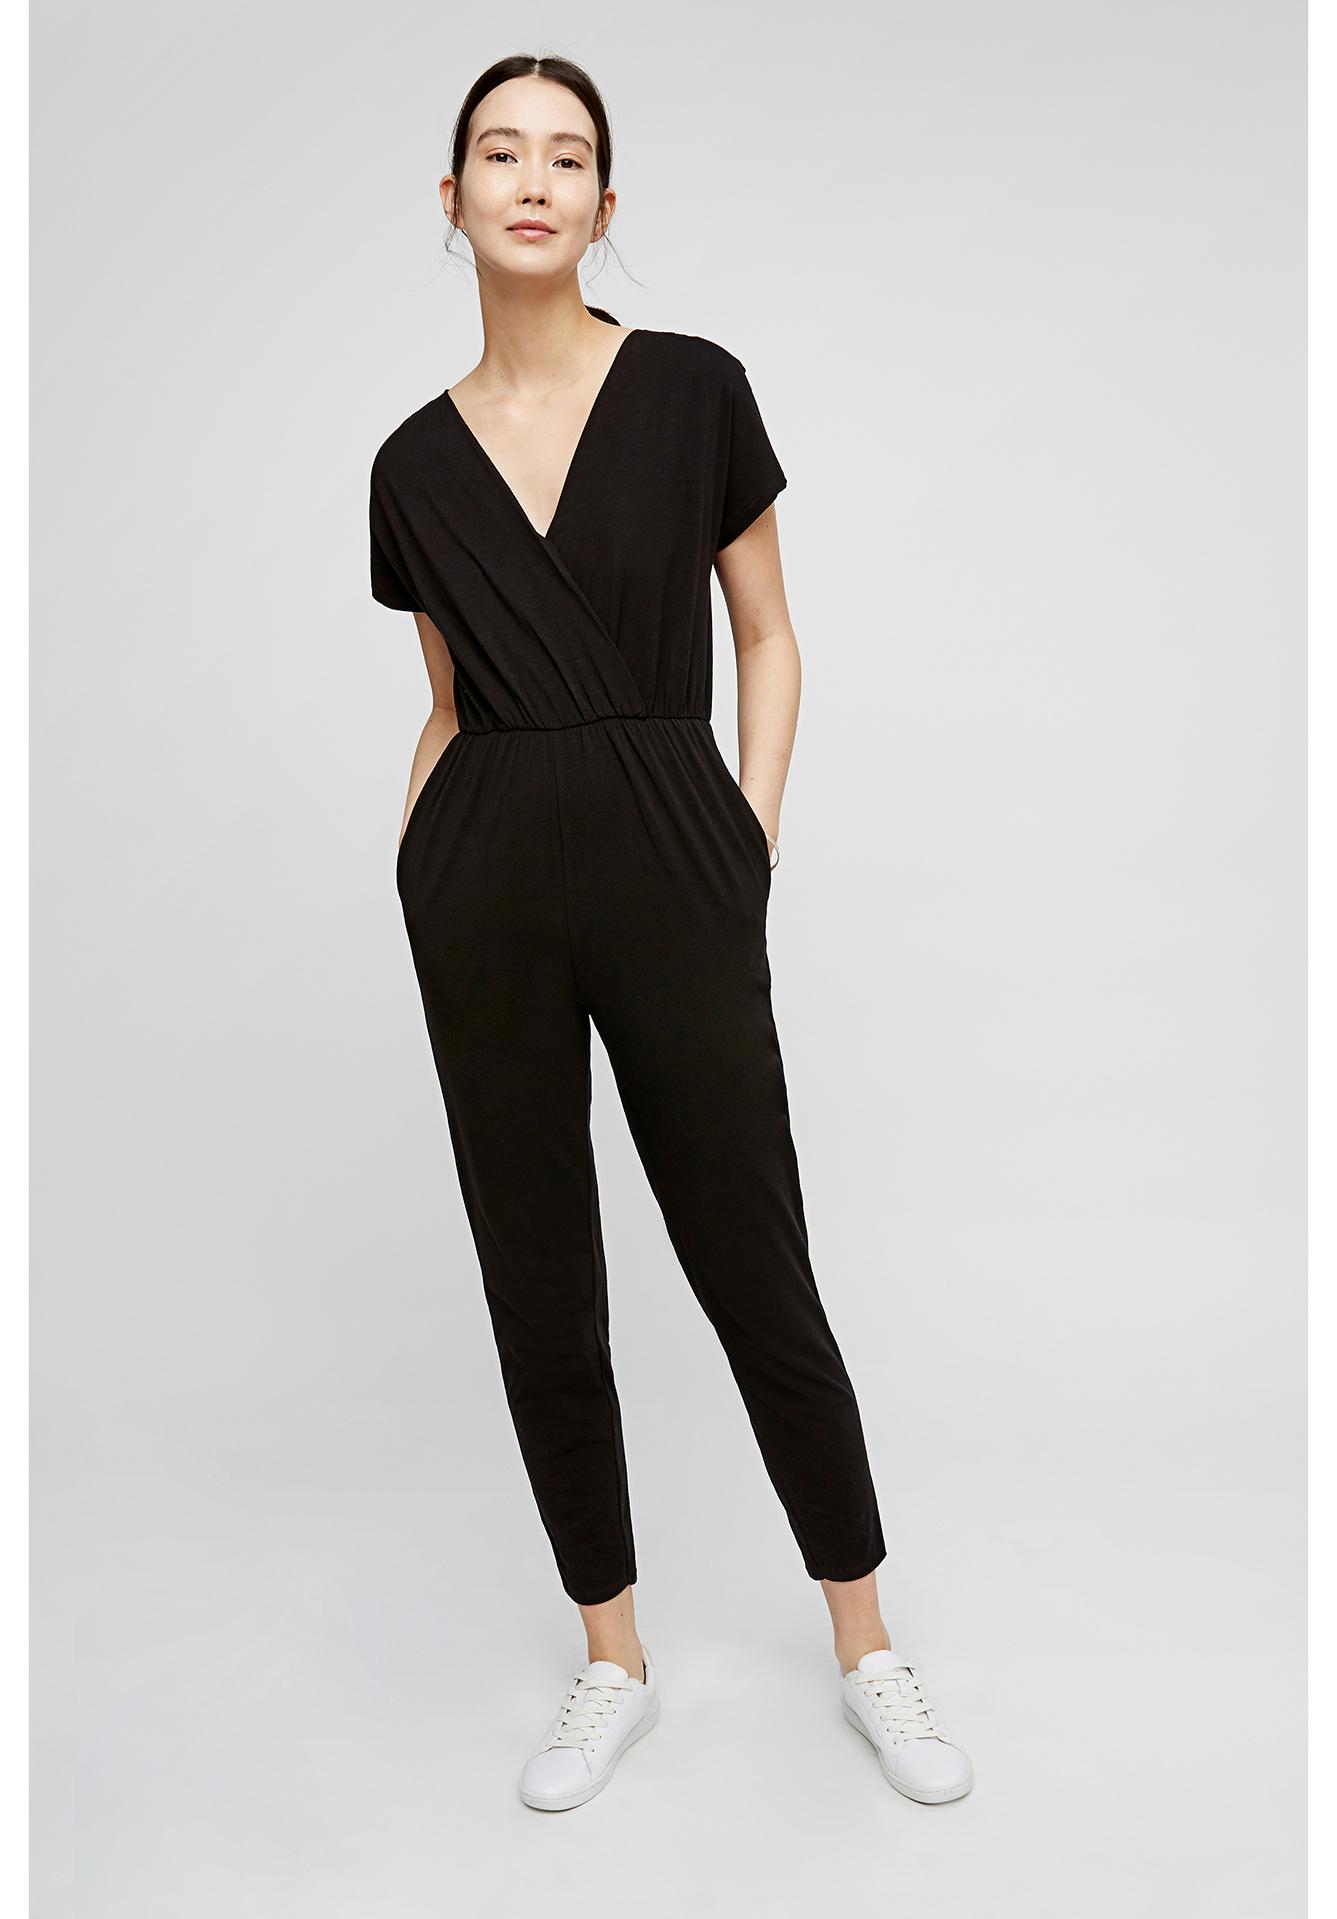 oliana-jumpsuit-in-black-5ca890706825.jpg